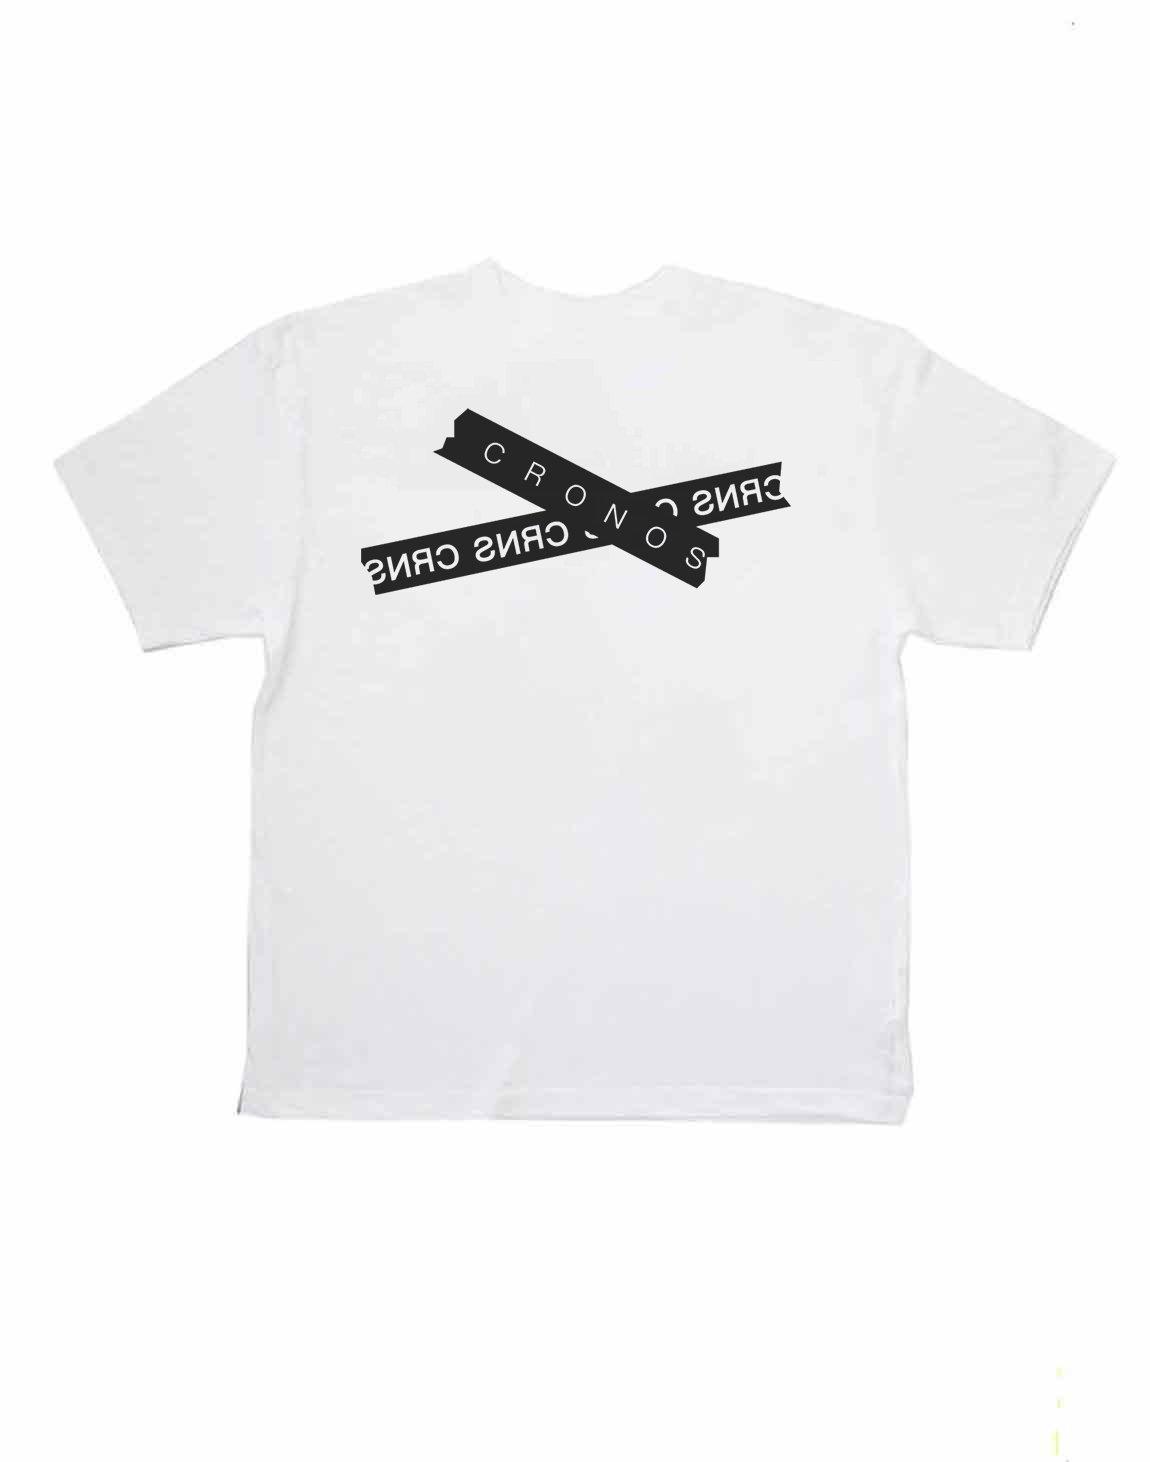 CRONOS TAPE LOGO OVER SIZE T-SHIRTS【WHITE】